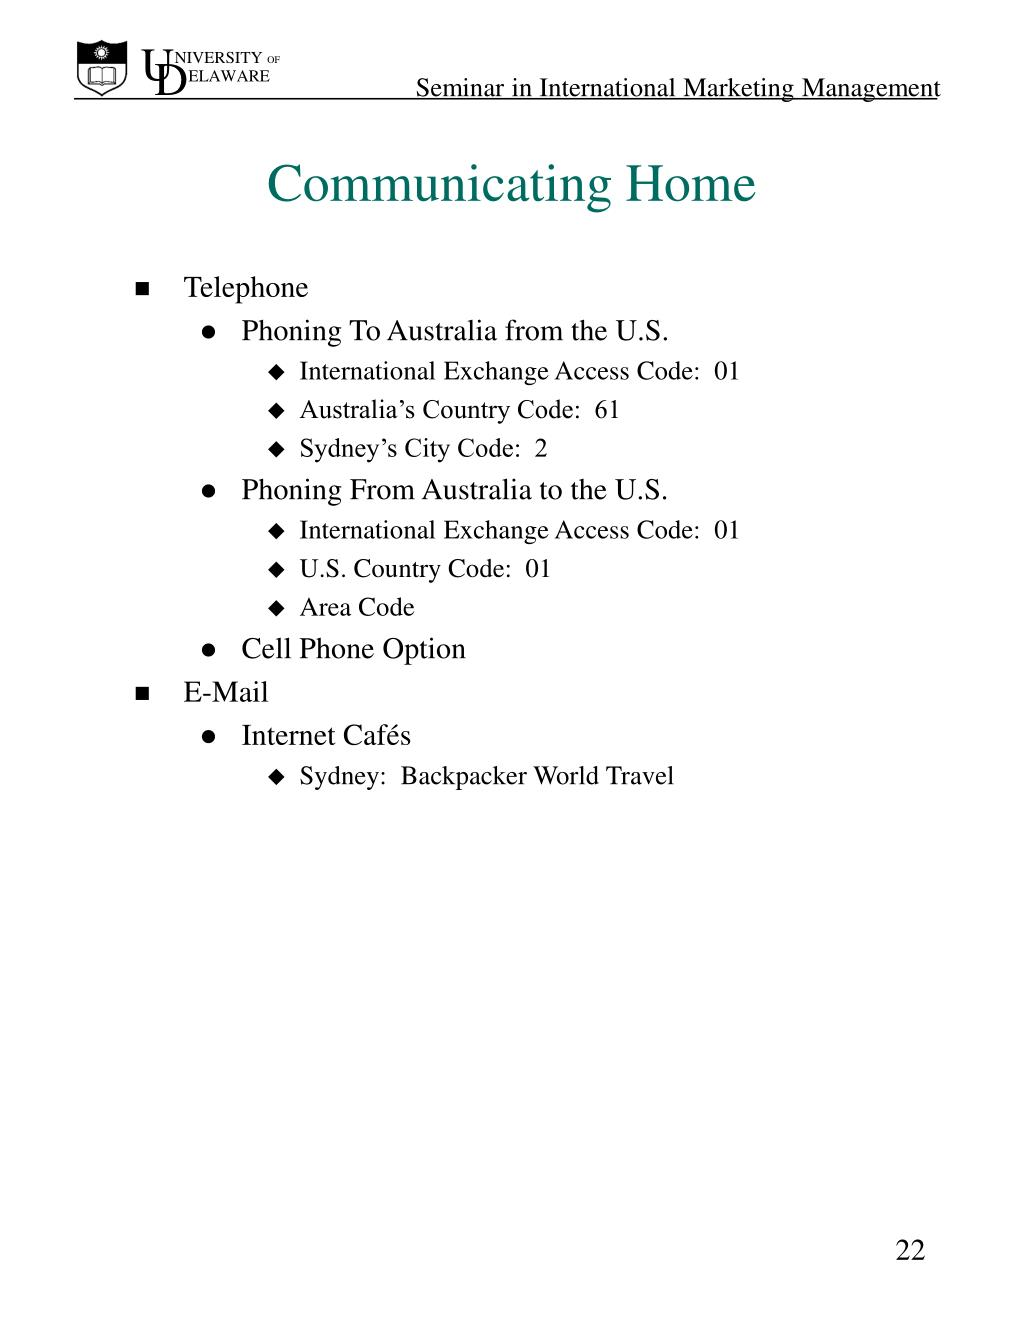 Communicating Home